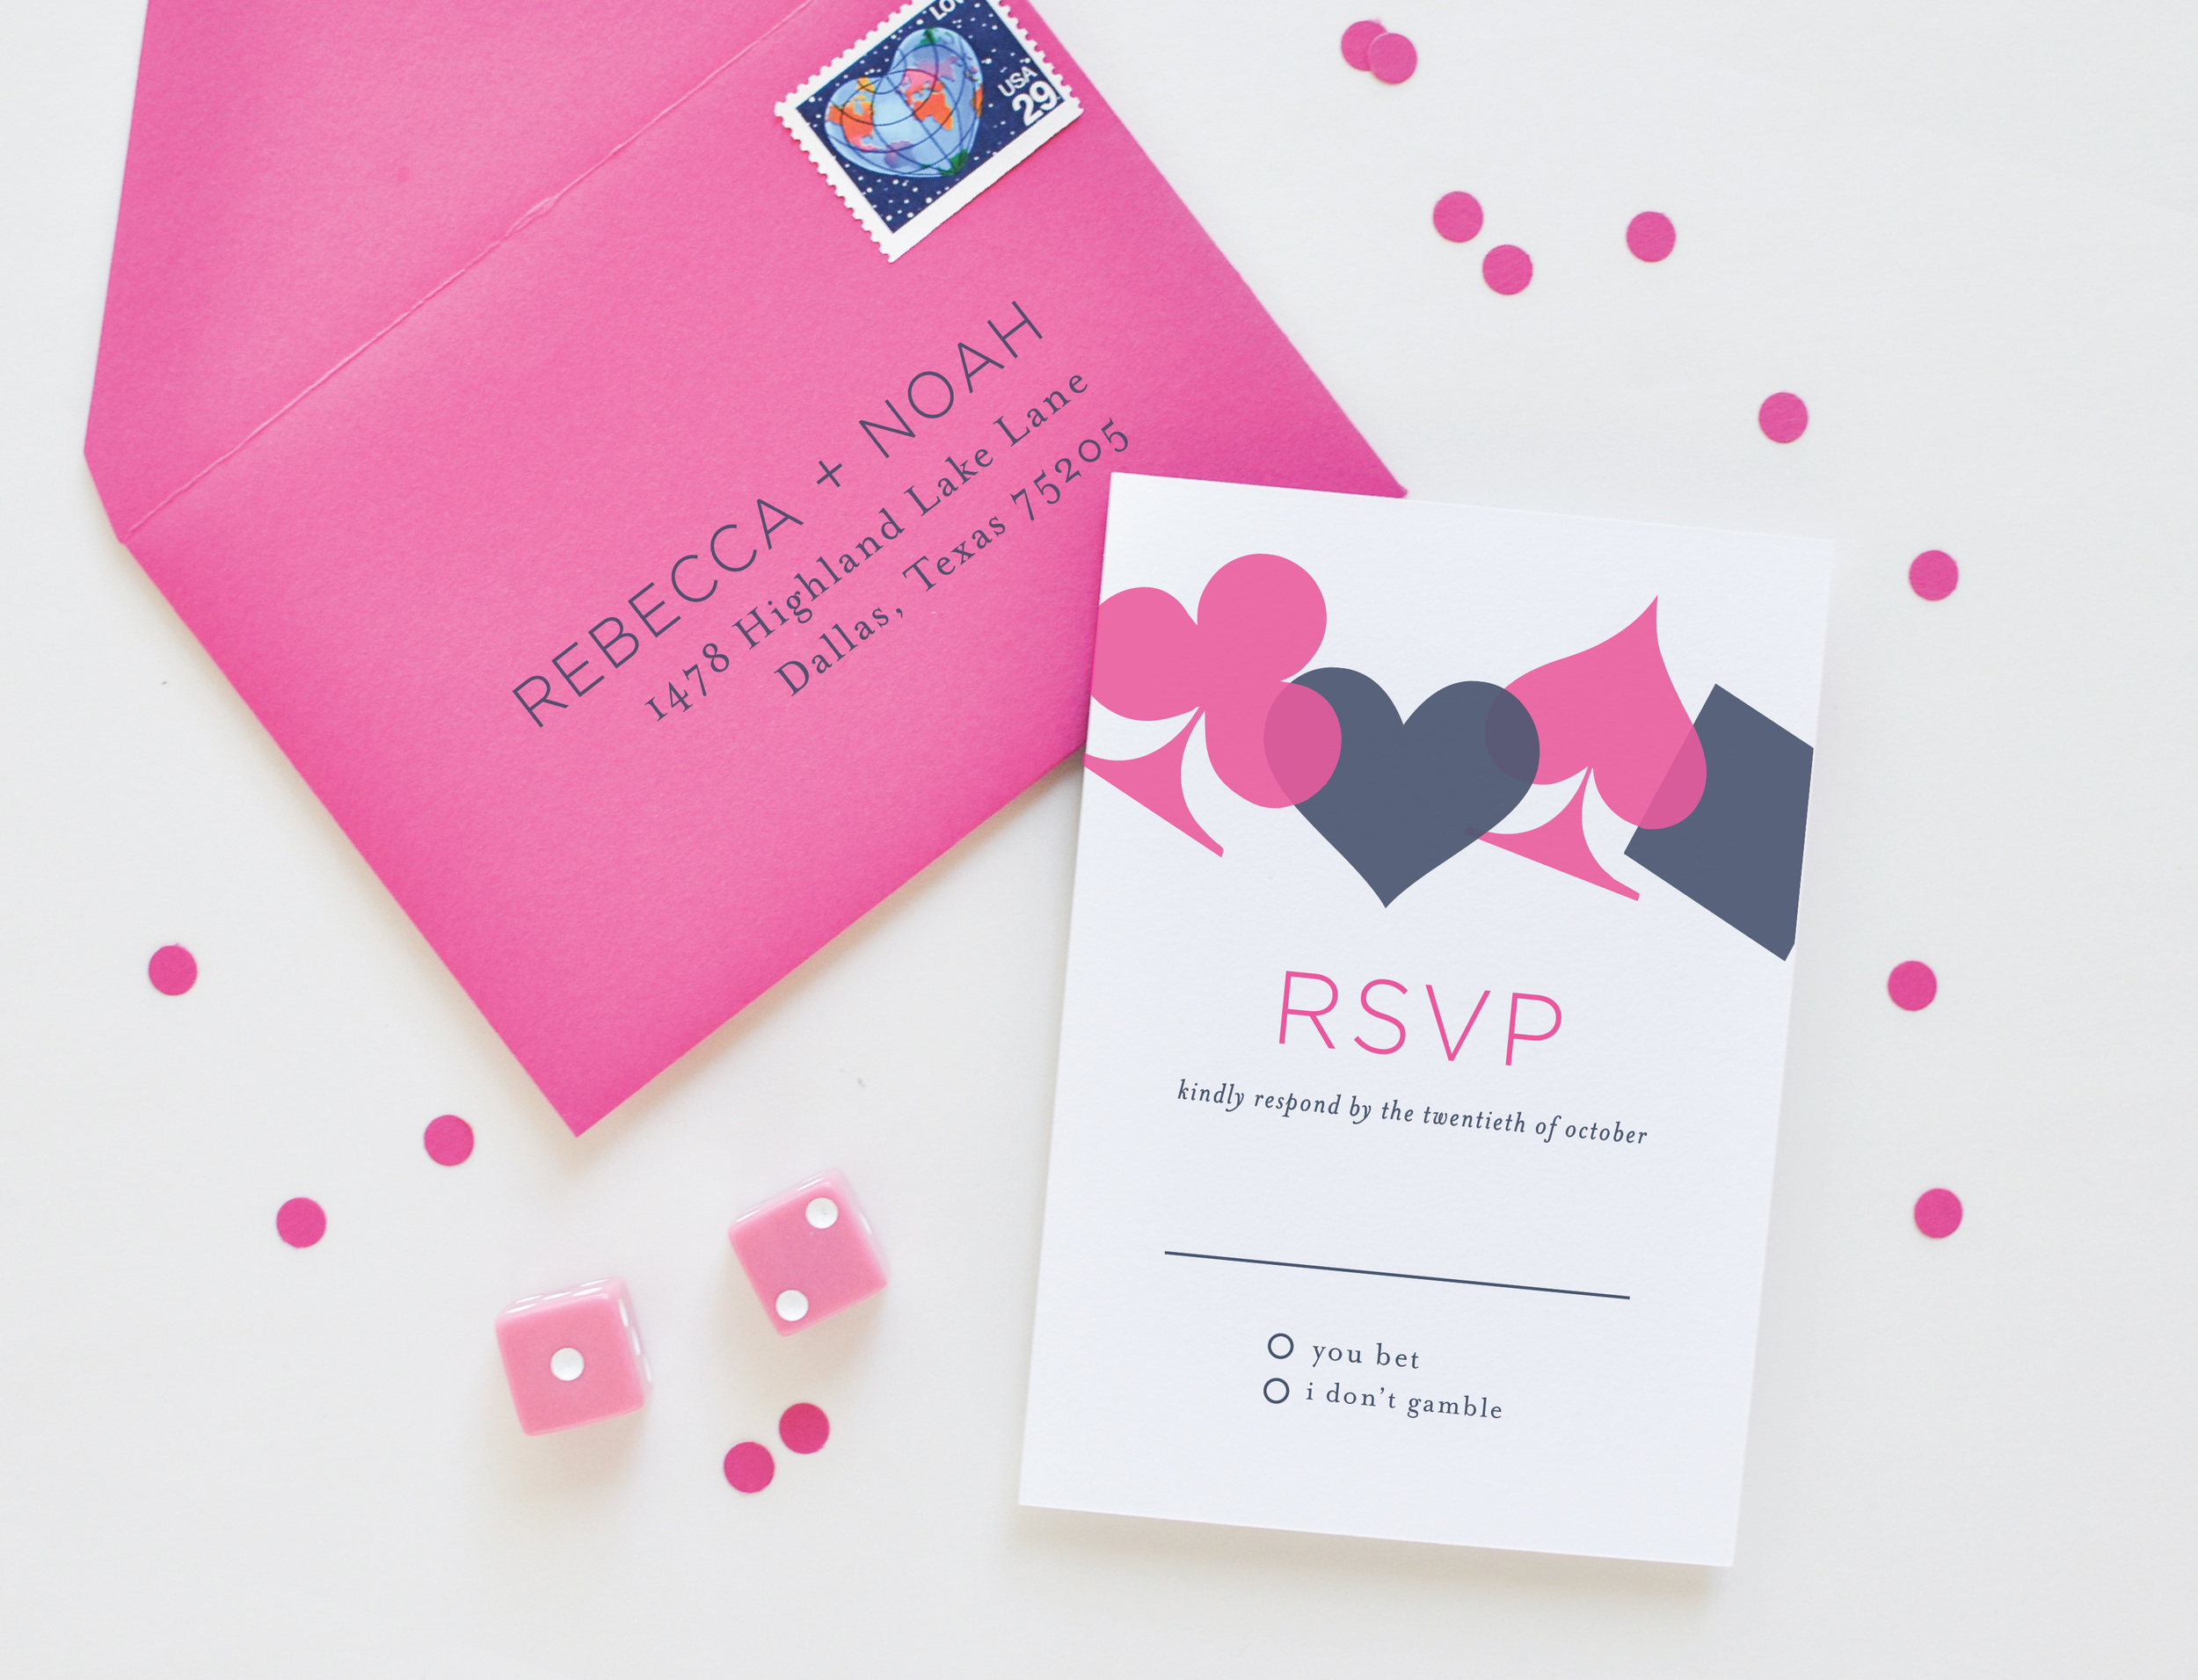 Vegas_Casino Wedding Invitation3-01.jpg